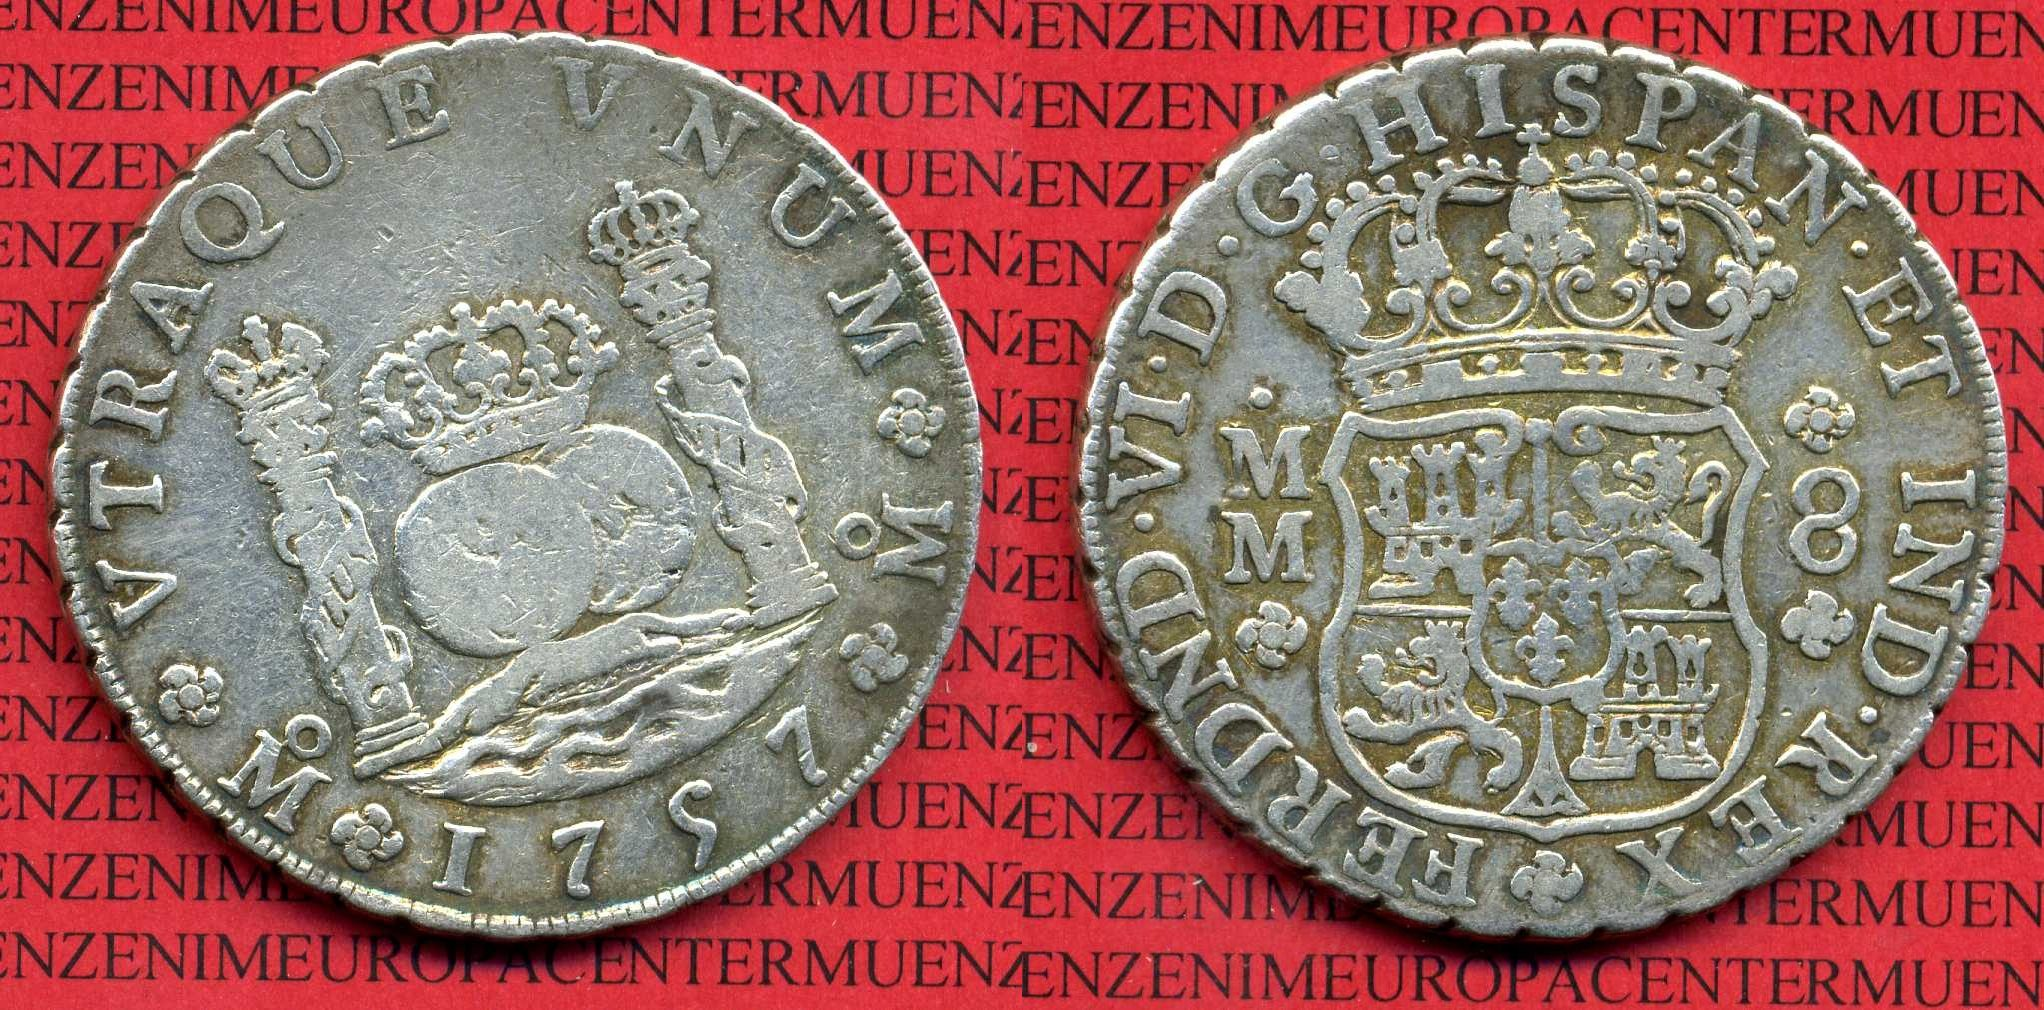 8 Reales Silbermünze Wappen M Säulen 1757 Mexico Mexiko Unter